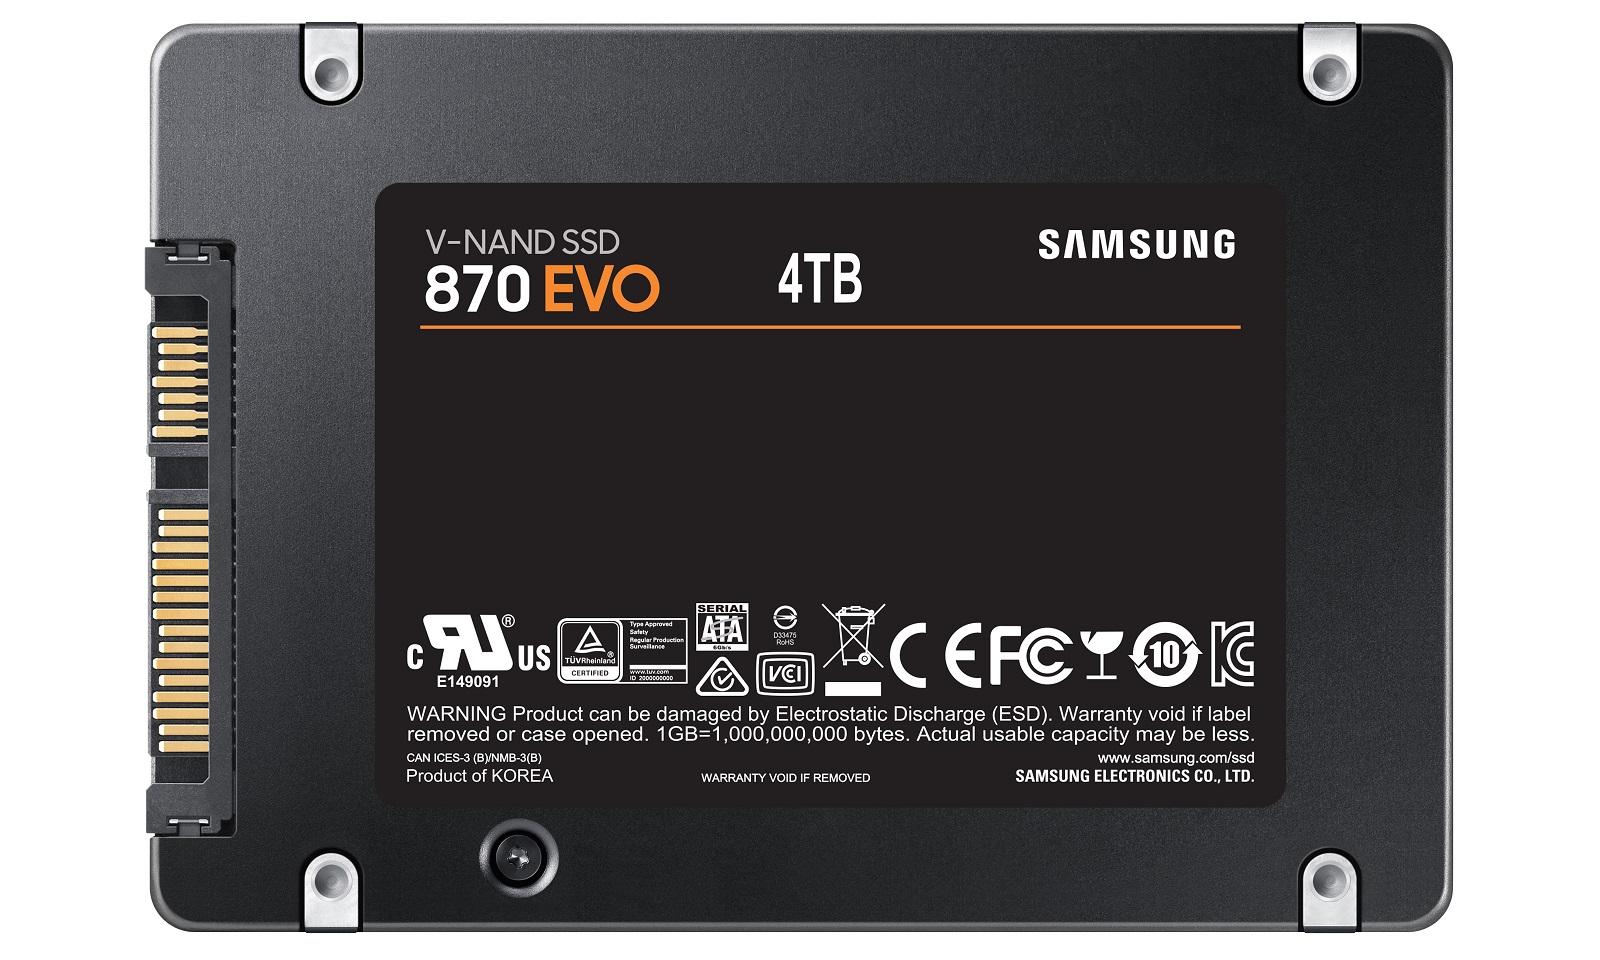 Samsung 870 EVO Drive Back